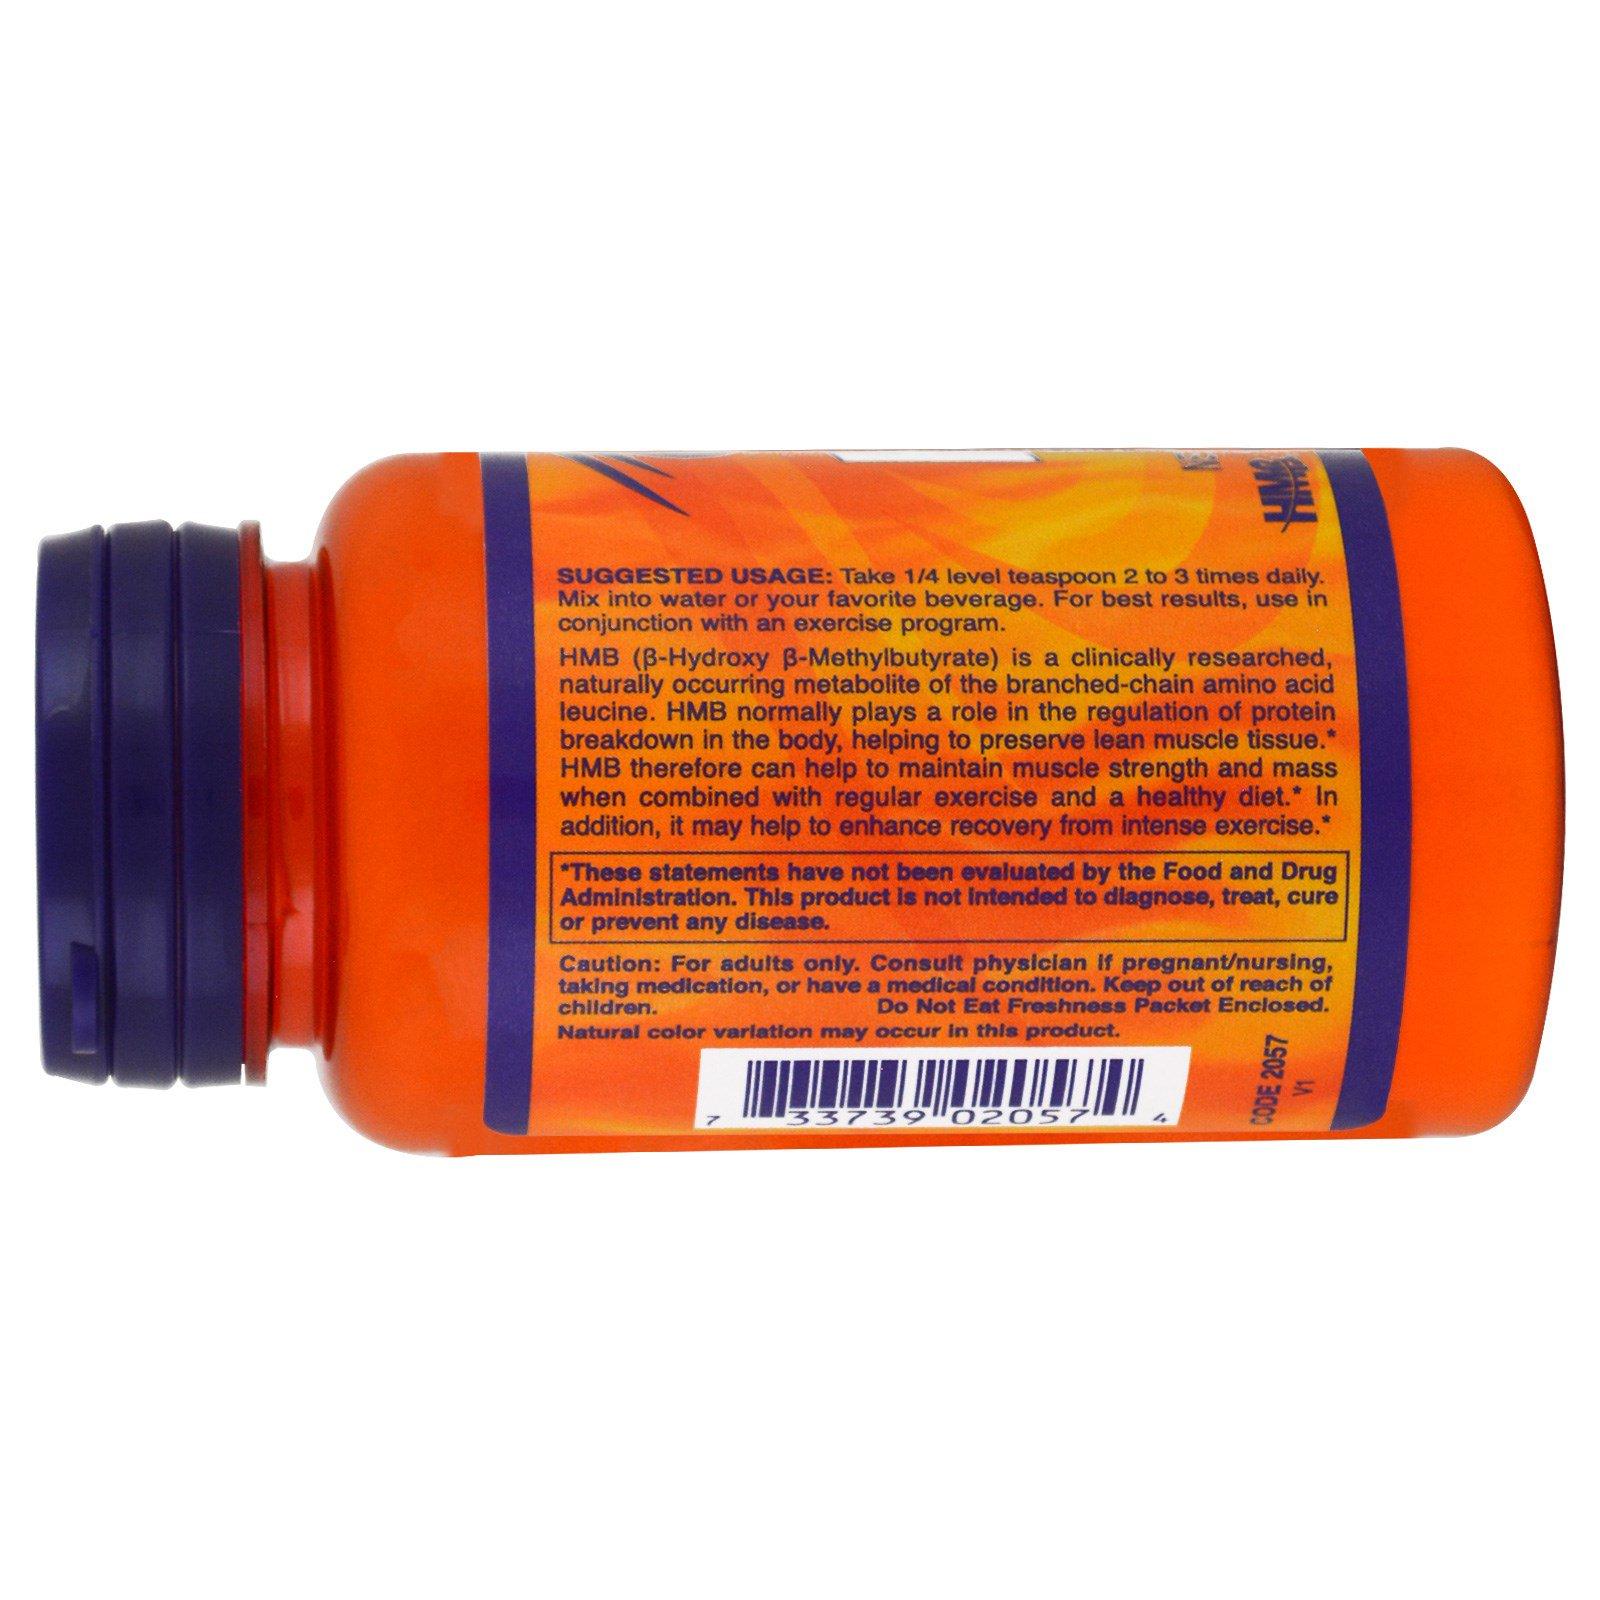 HMB Powder (90 gram) Now Foods, HMB (B-Hydroxy B-Methylbutyrate) is a clinically researched, naturally occurring metabolite of the branched-chain amino acid leucine.Extra gegevens:Merk : Now FoodsVerzendkosten : 3.95Levertijd : Vóór 23.00 besteld op werkdagen is morgen in huis.